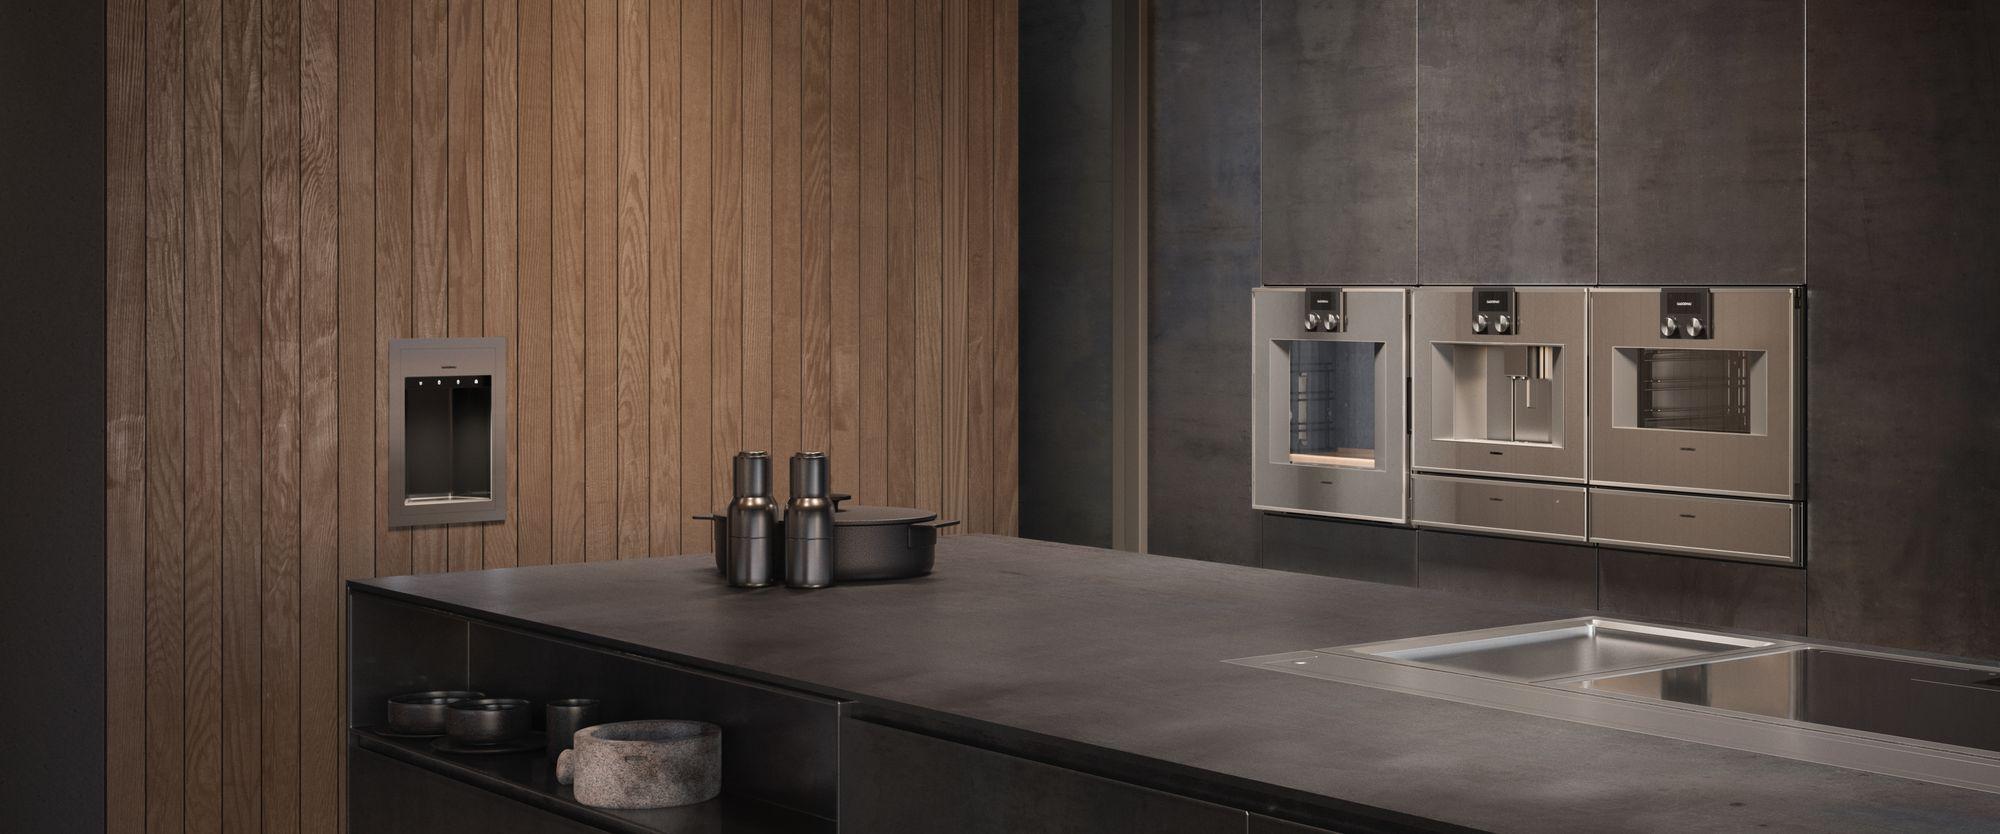 Gaggenau inbouwapparatuur 400 serie #gaggenau #ovens #inbouwapparaten #koffievolautomaat #bakoven #keuken